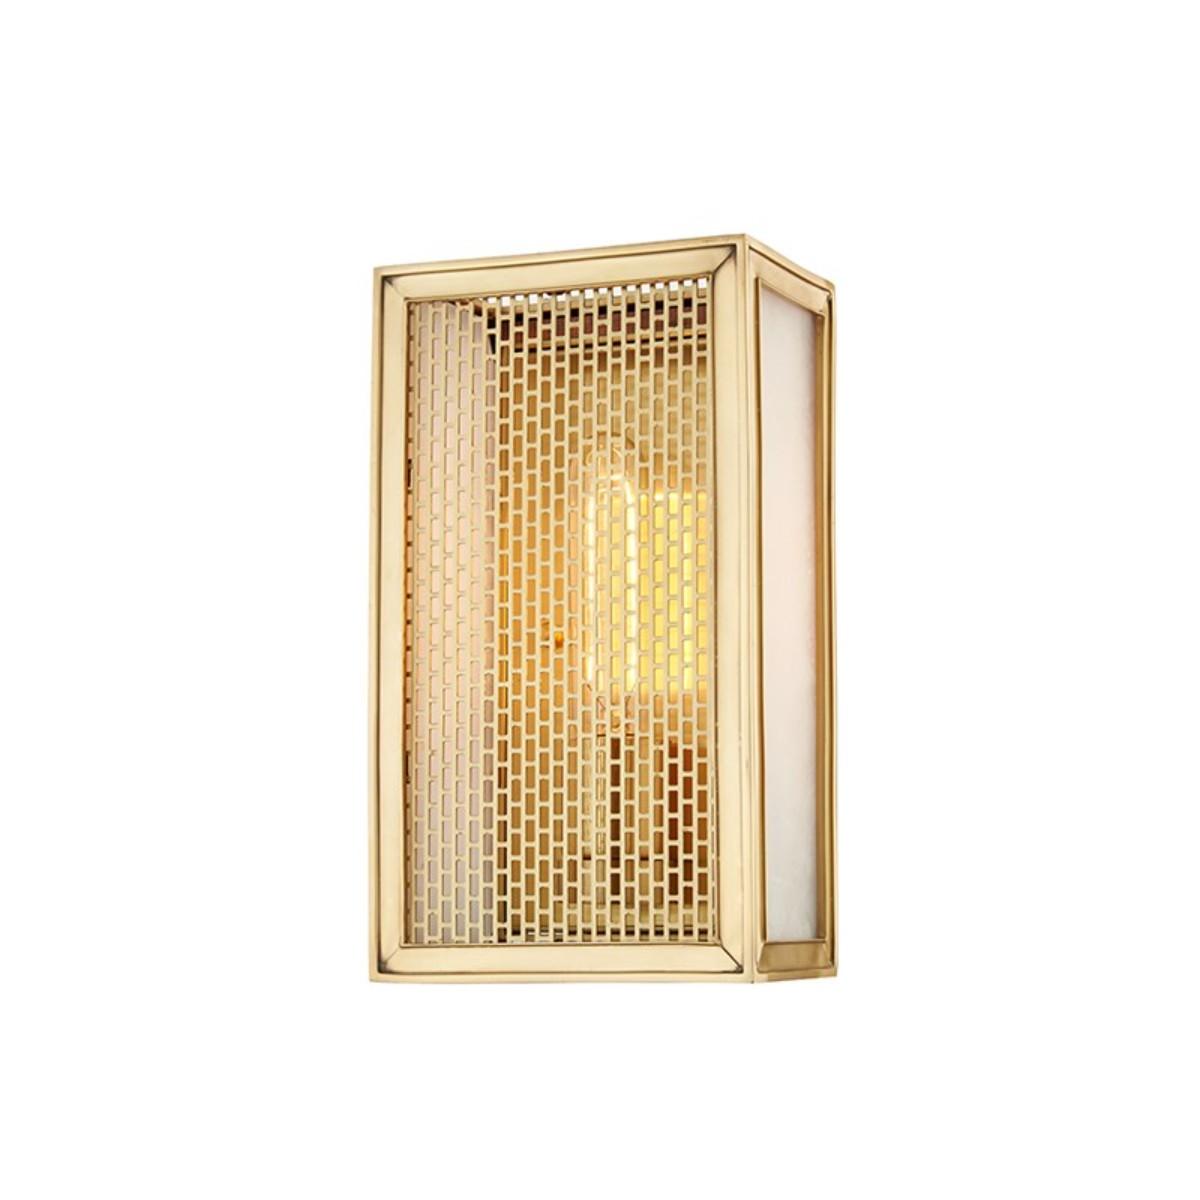 Hudson Valley | Ashford Wall Light | Aged Brass